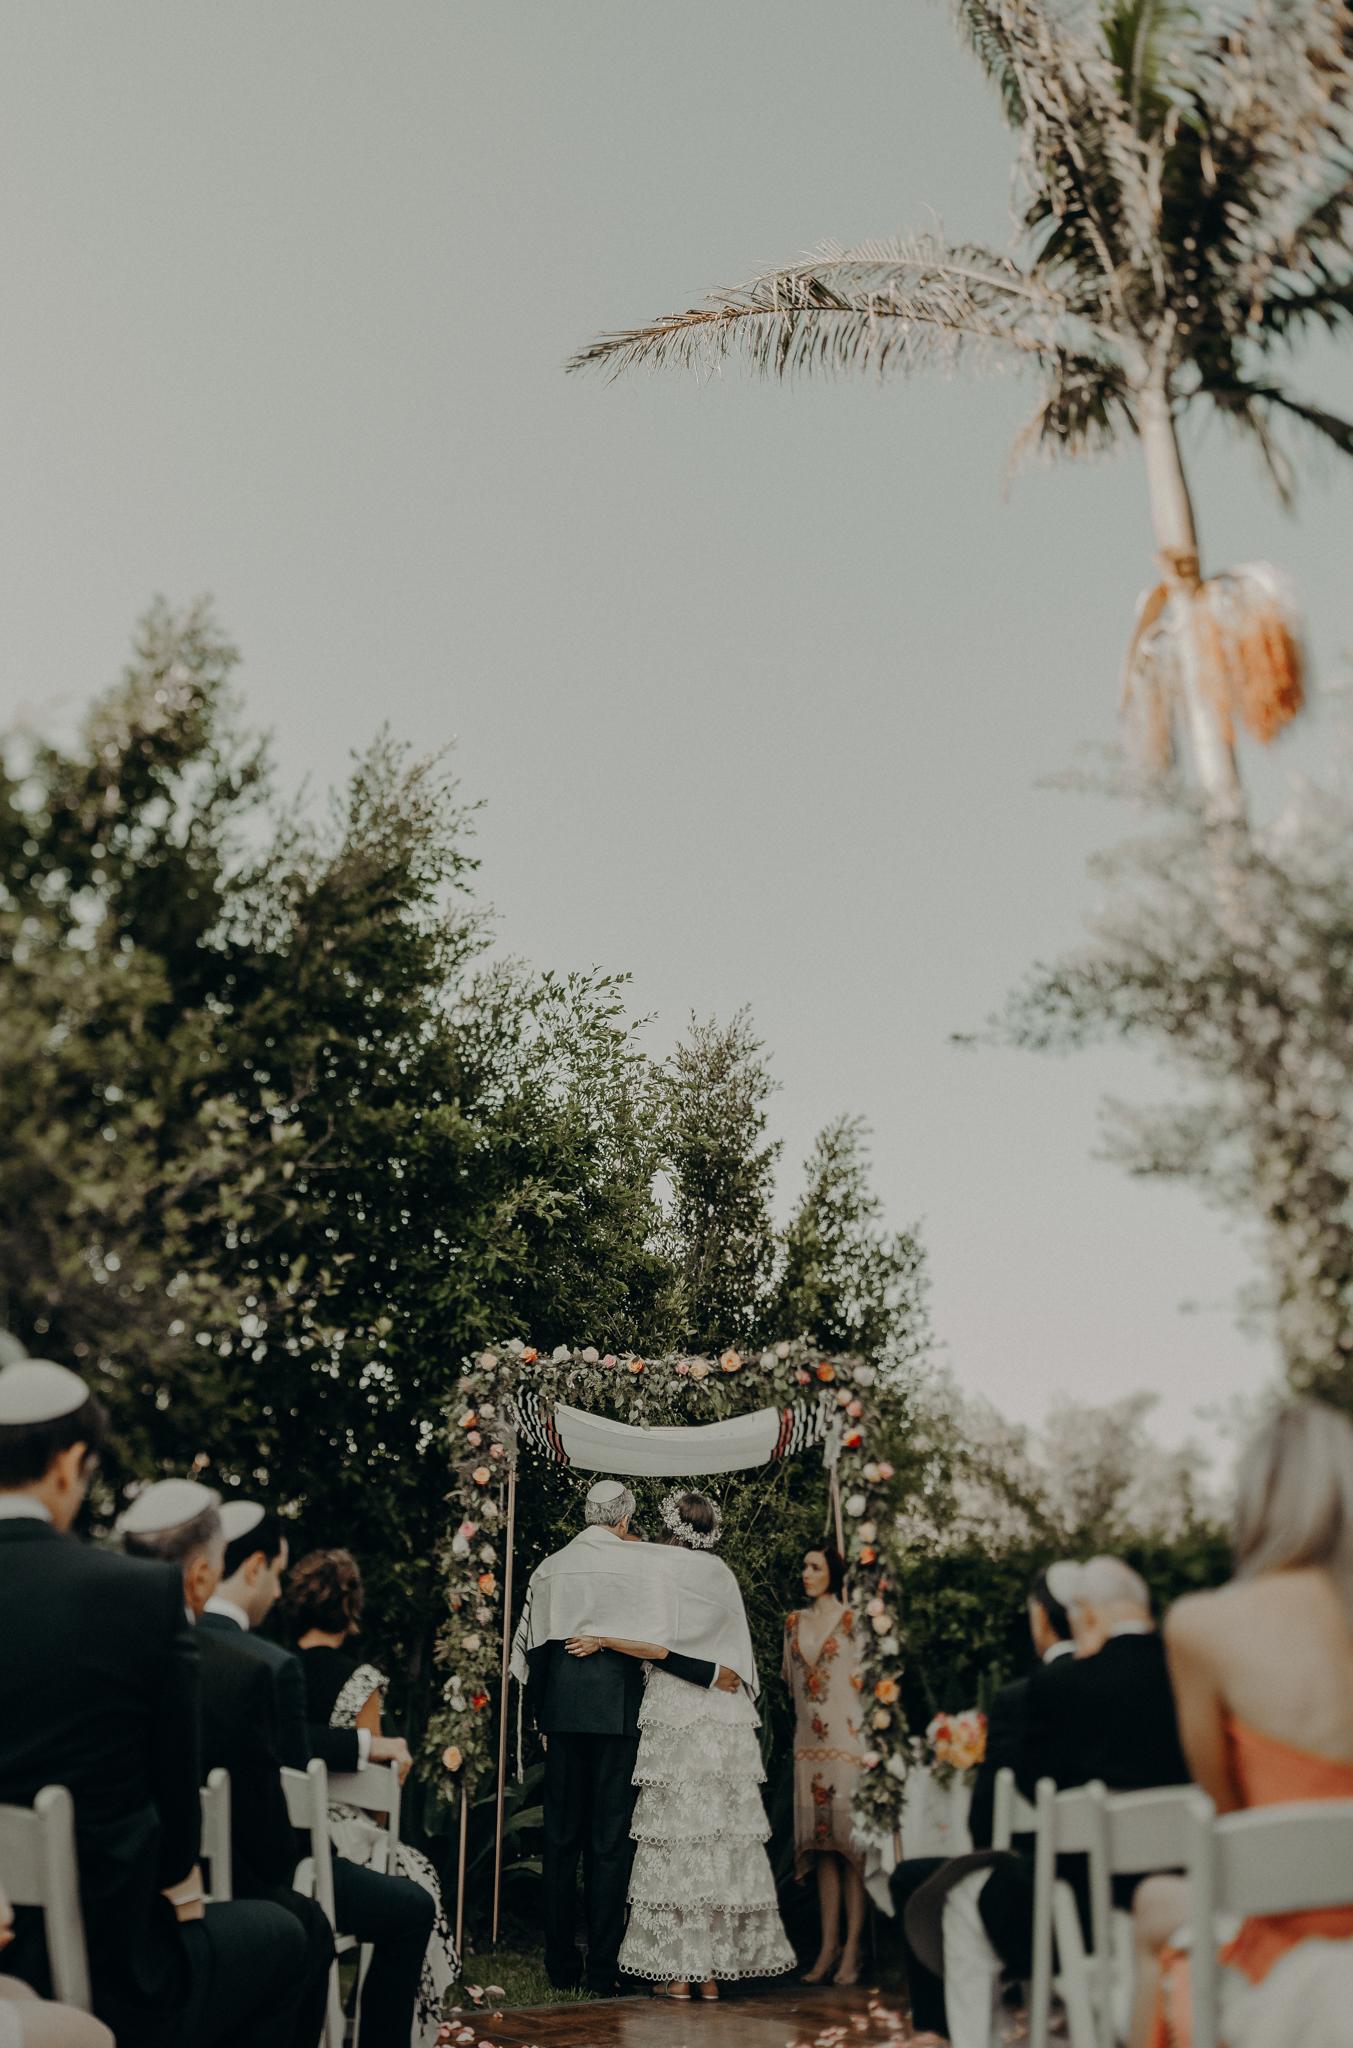 Isaiah + Taylor Photography - Private Estate Backyard Wedding - Beverly Hills - Los Angeles Wedding Photographer - 79.jpg